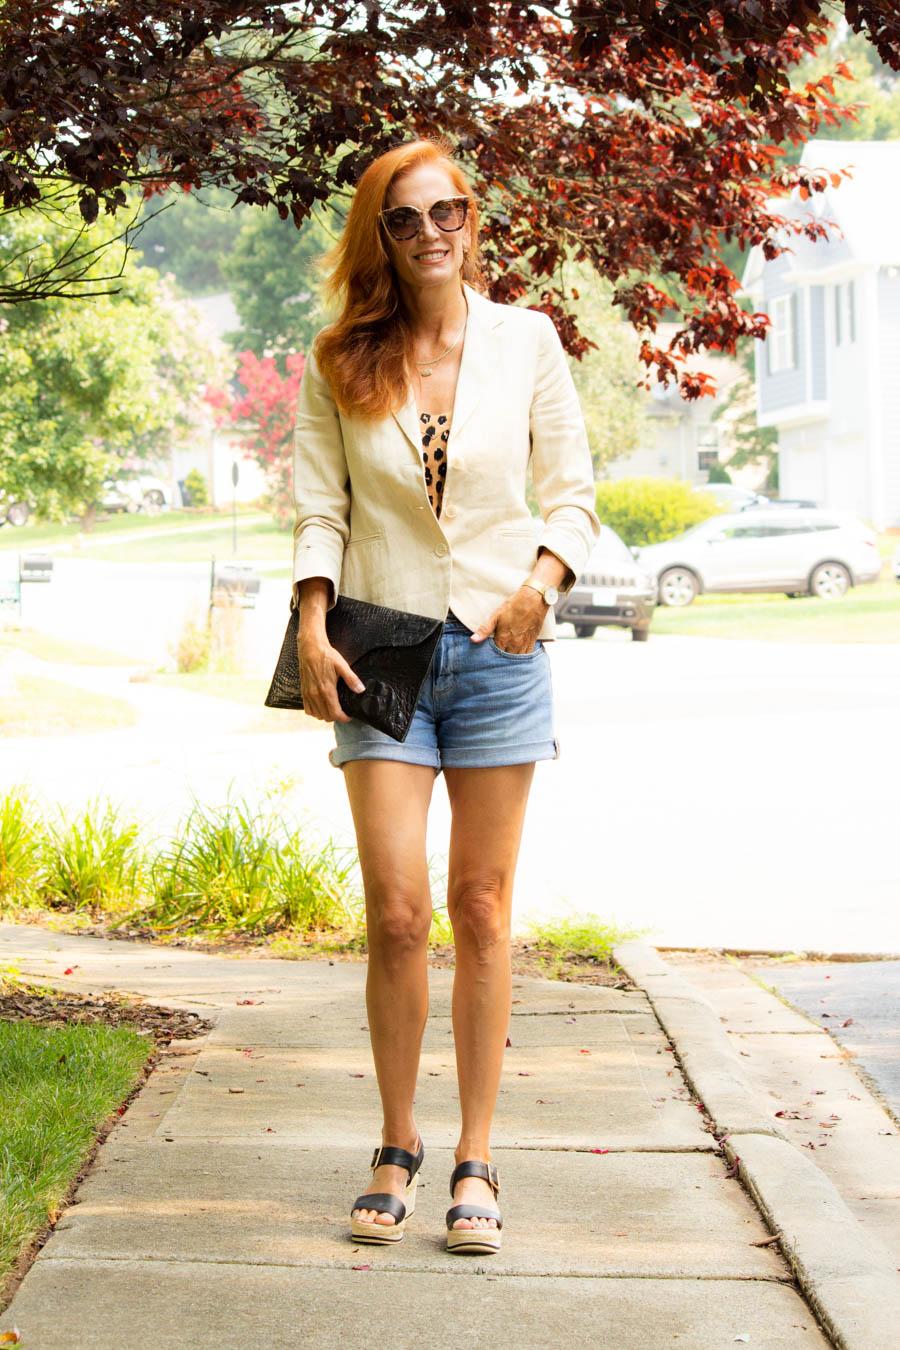 Women's casual denim shorts look